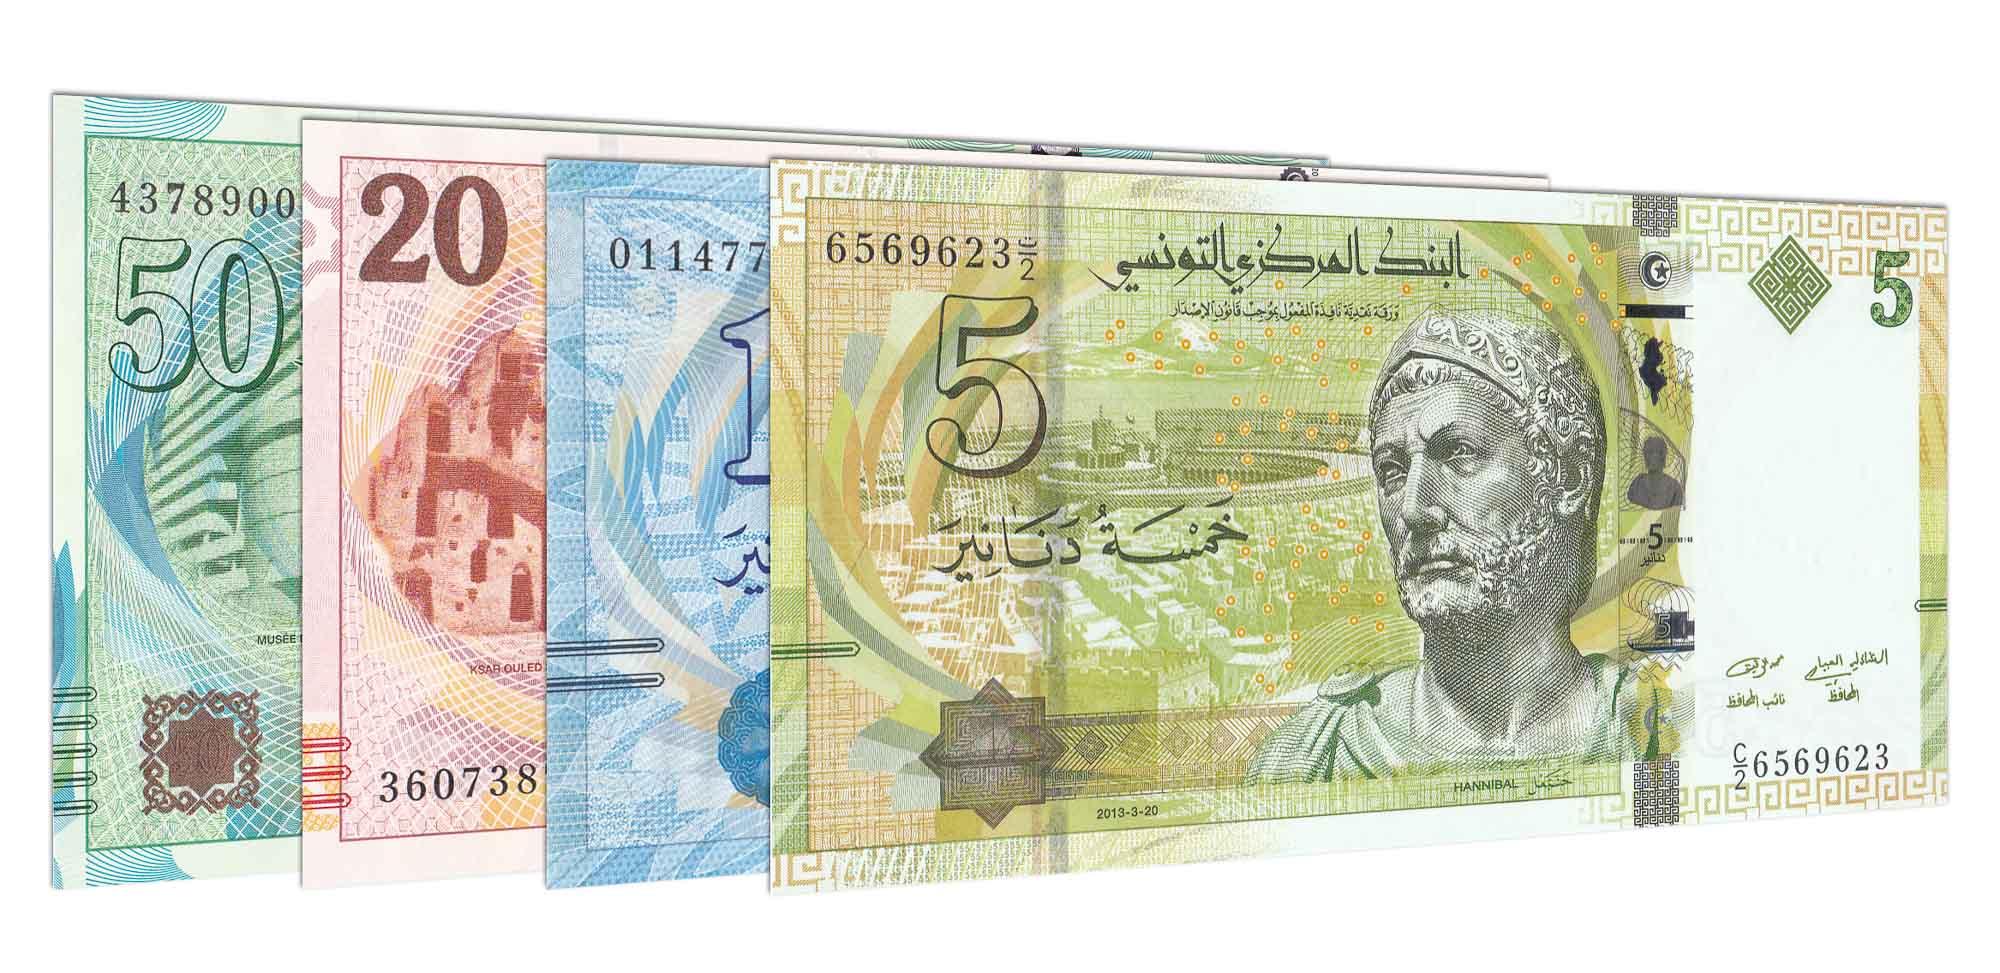 Tunisian Dinars Online Tnd Home